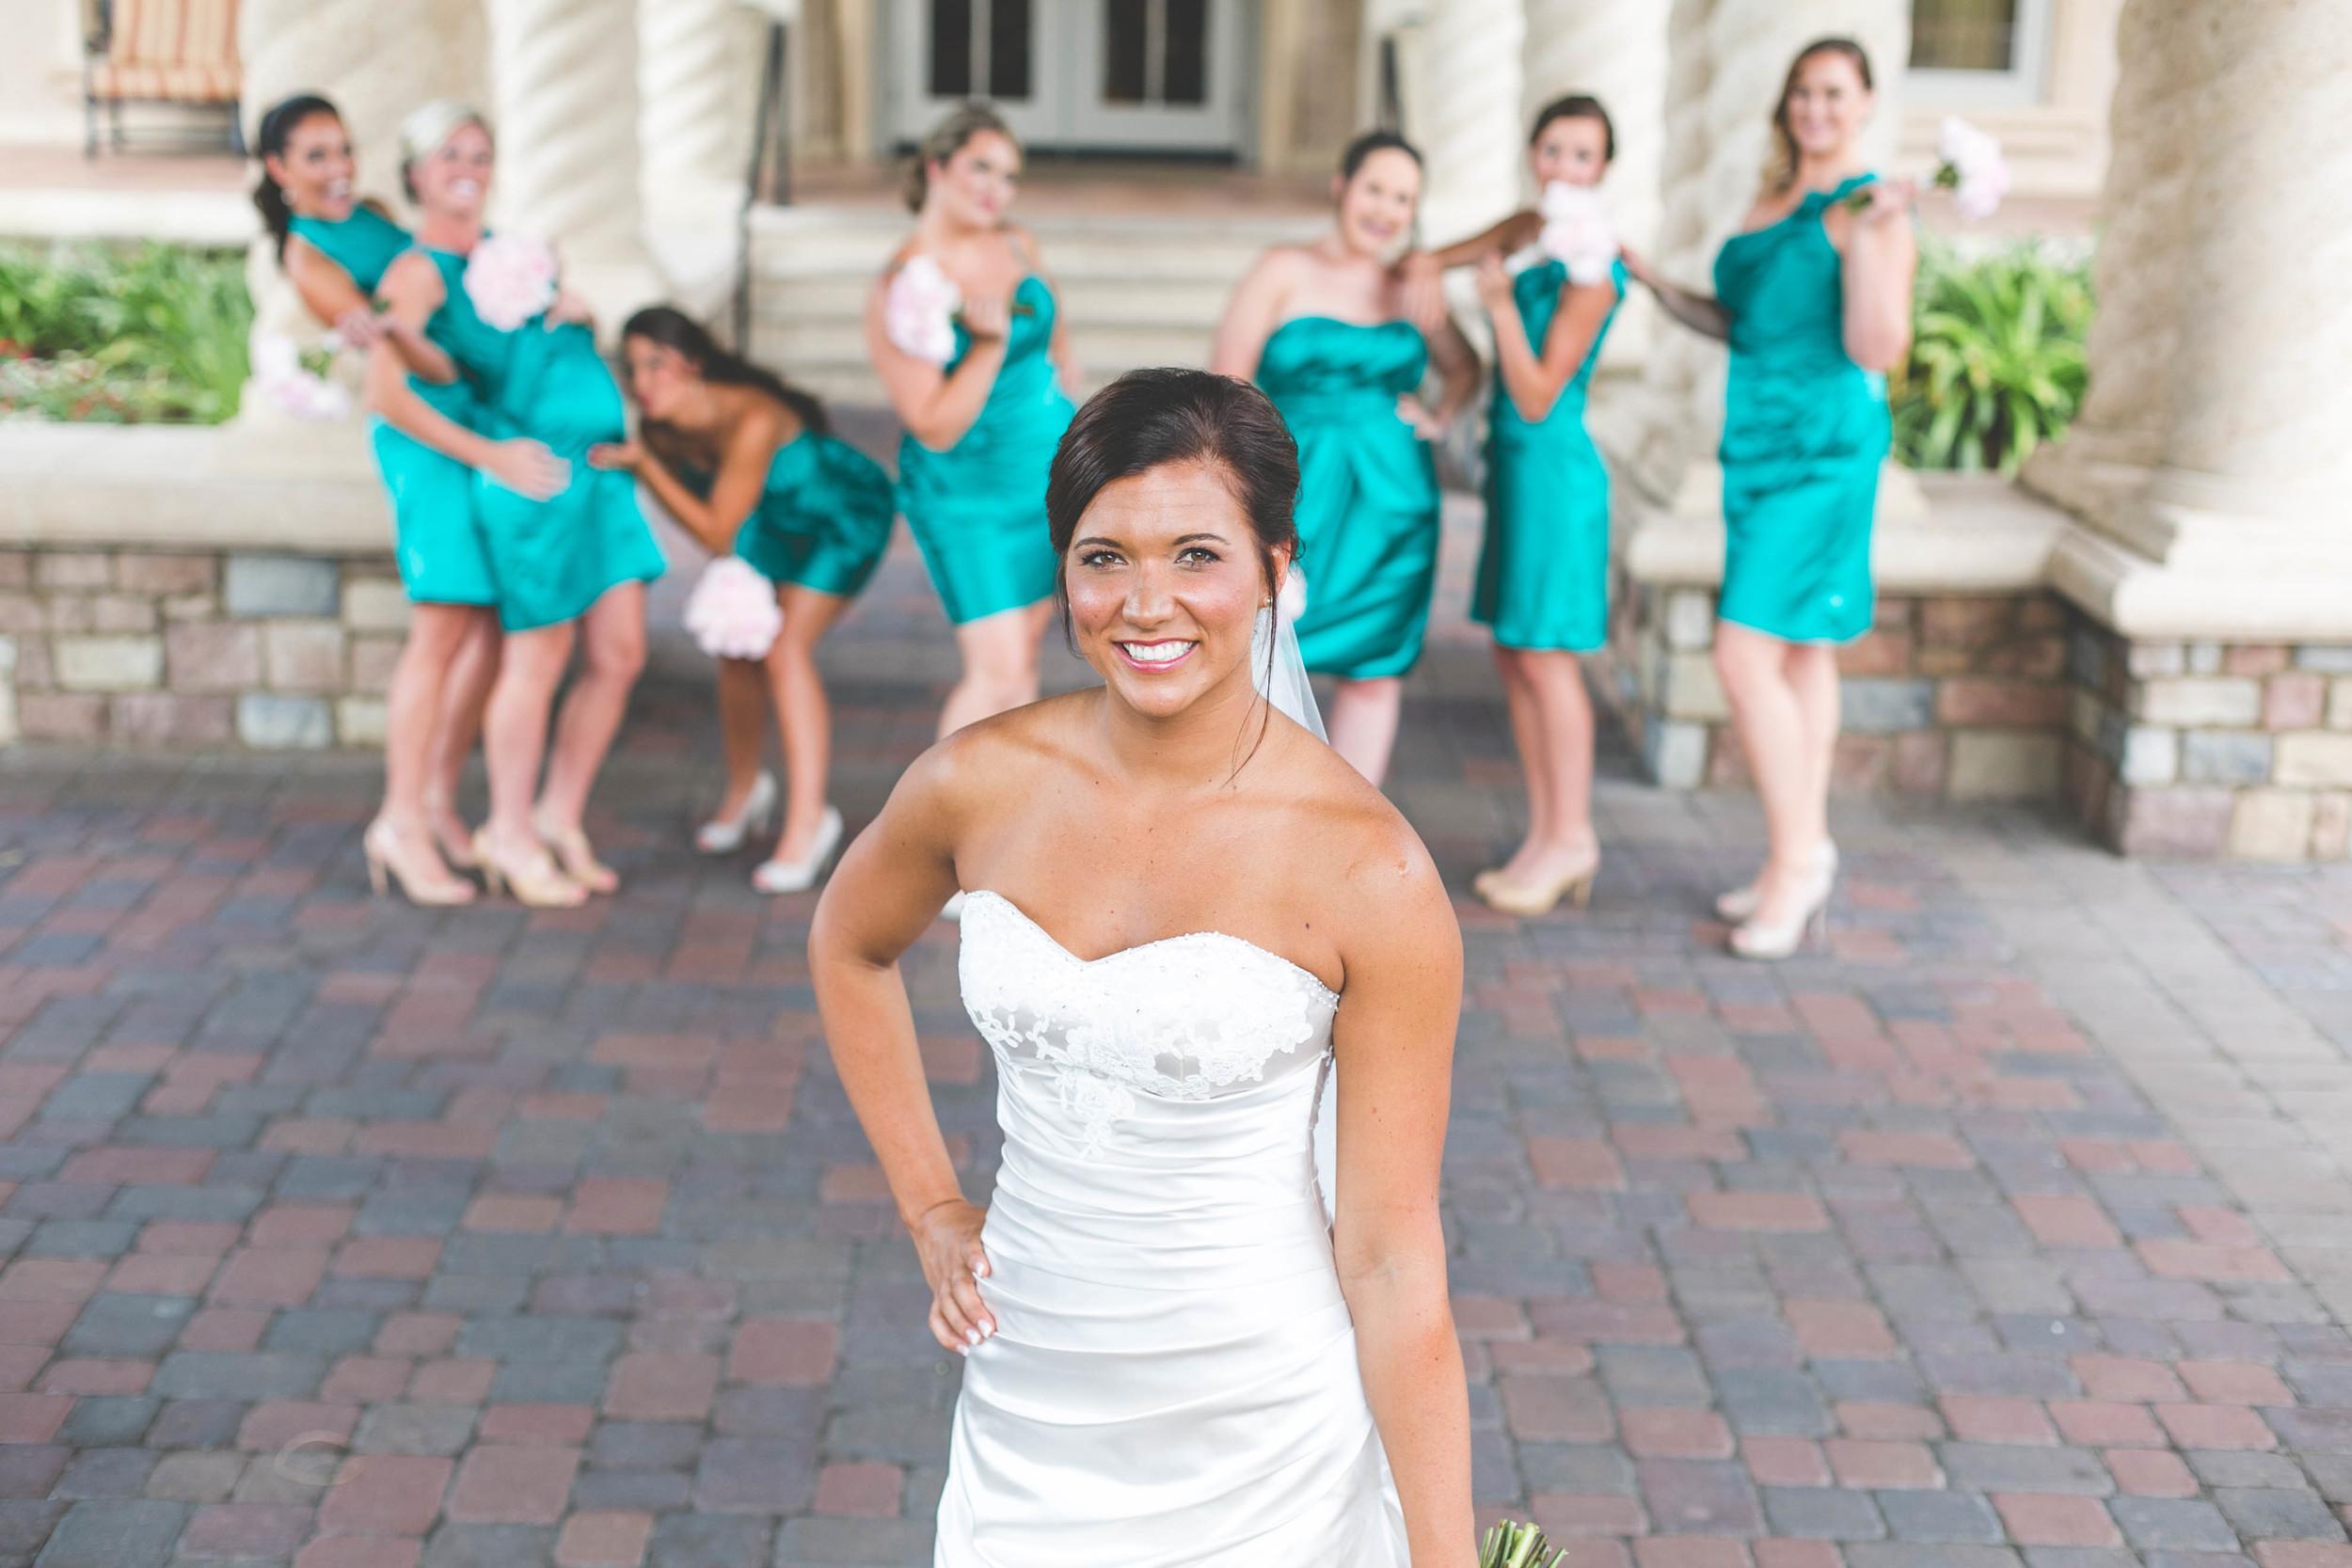 adam-szarmack-ponte-vedra-wedding-photographer-bridal-party.jpg